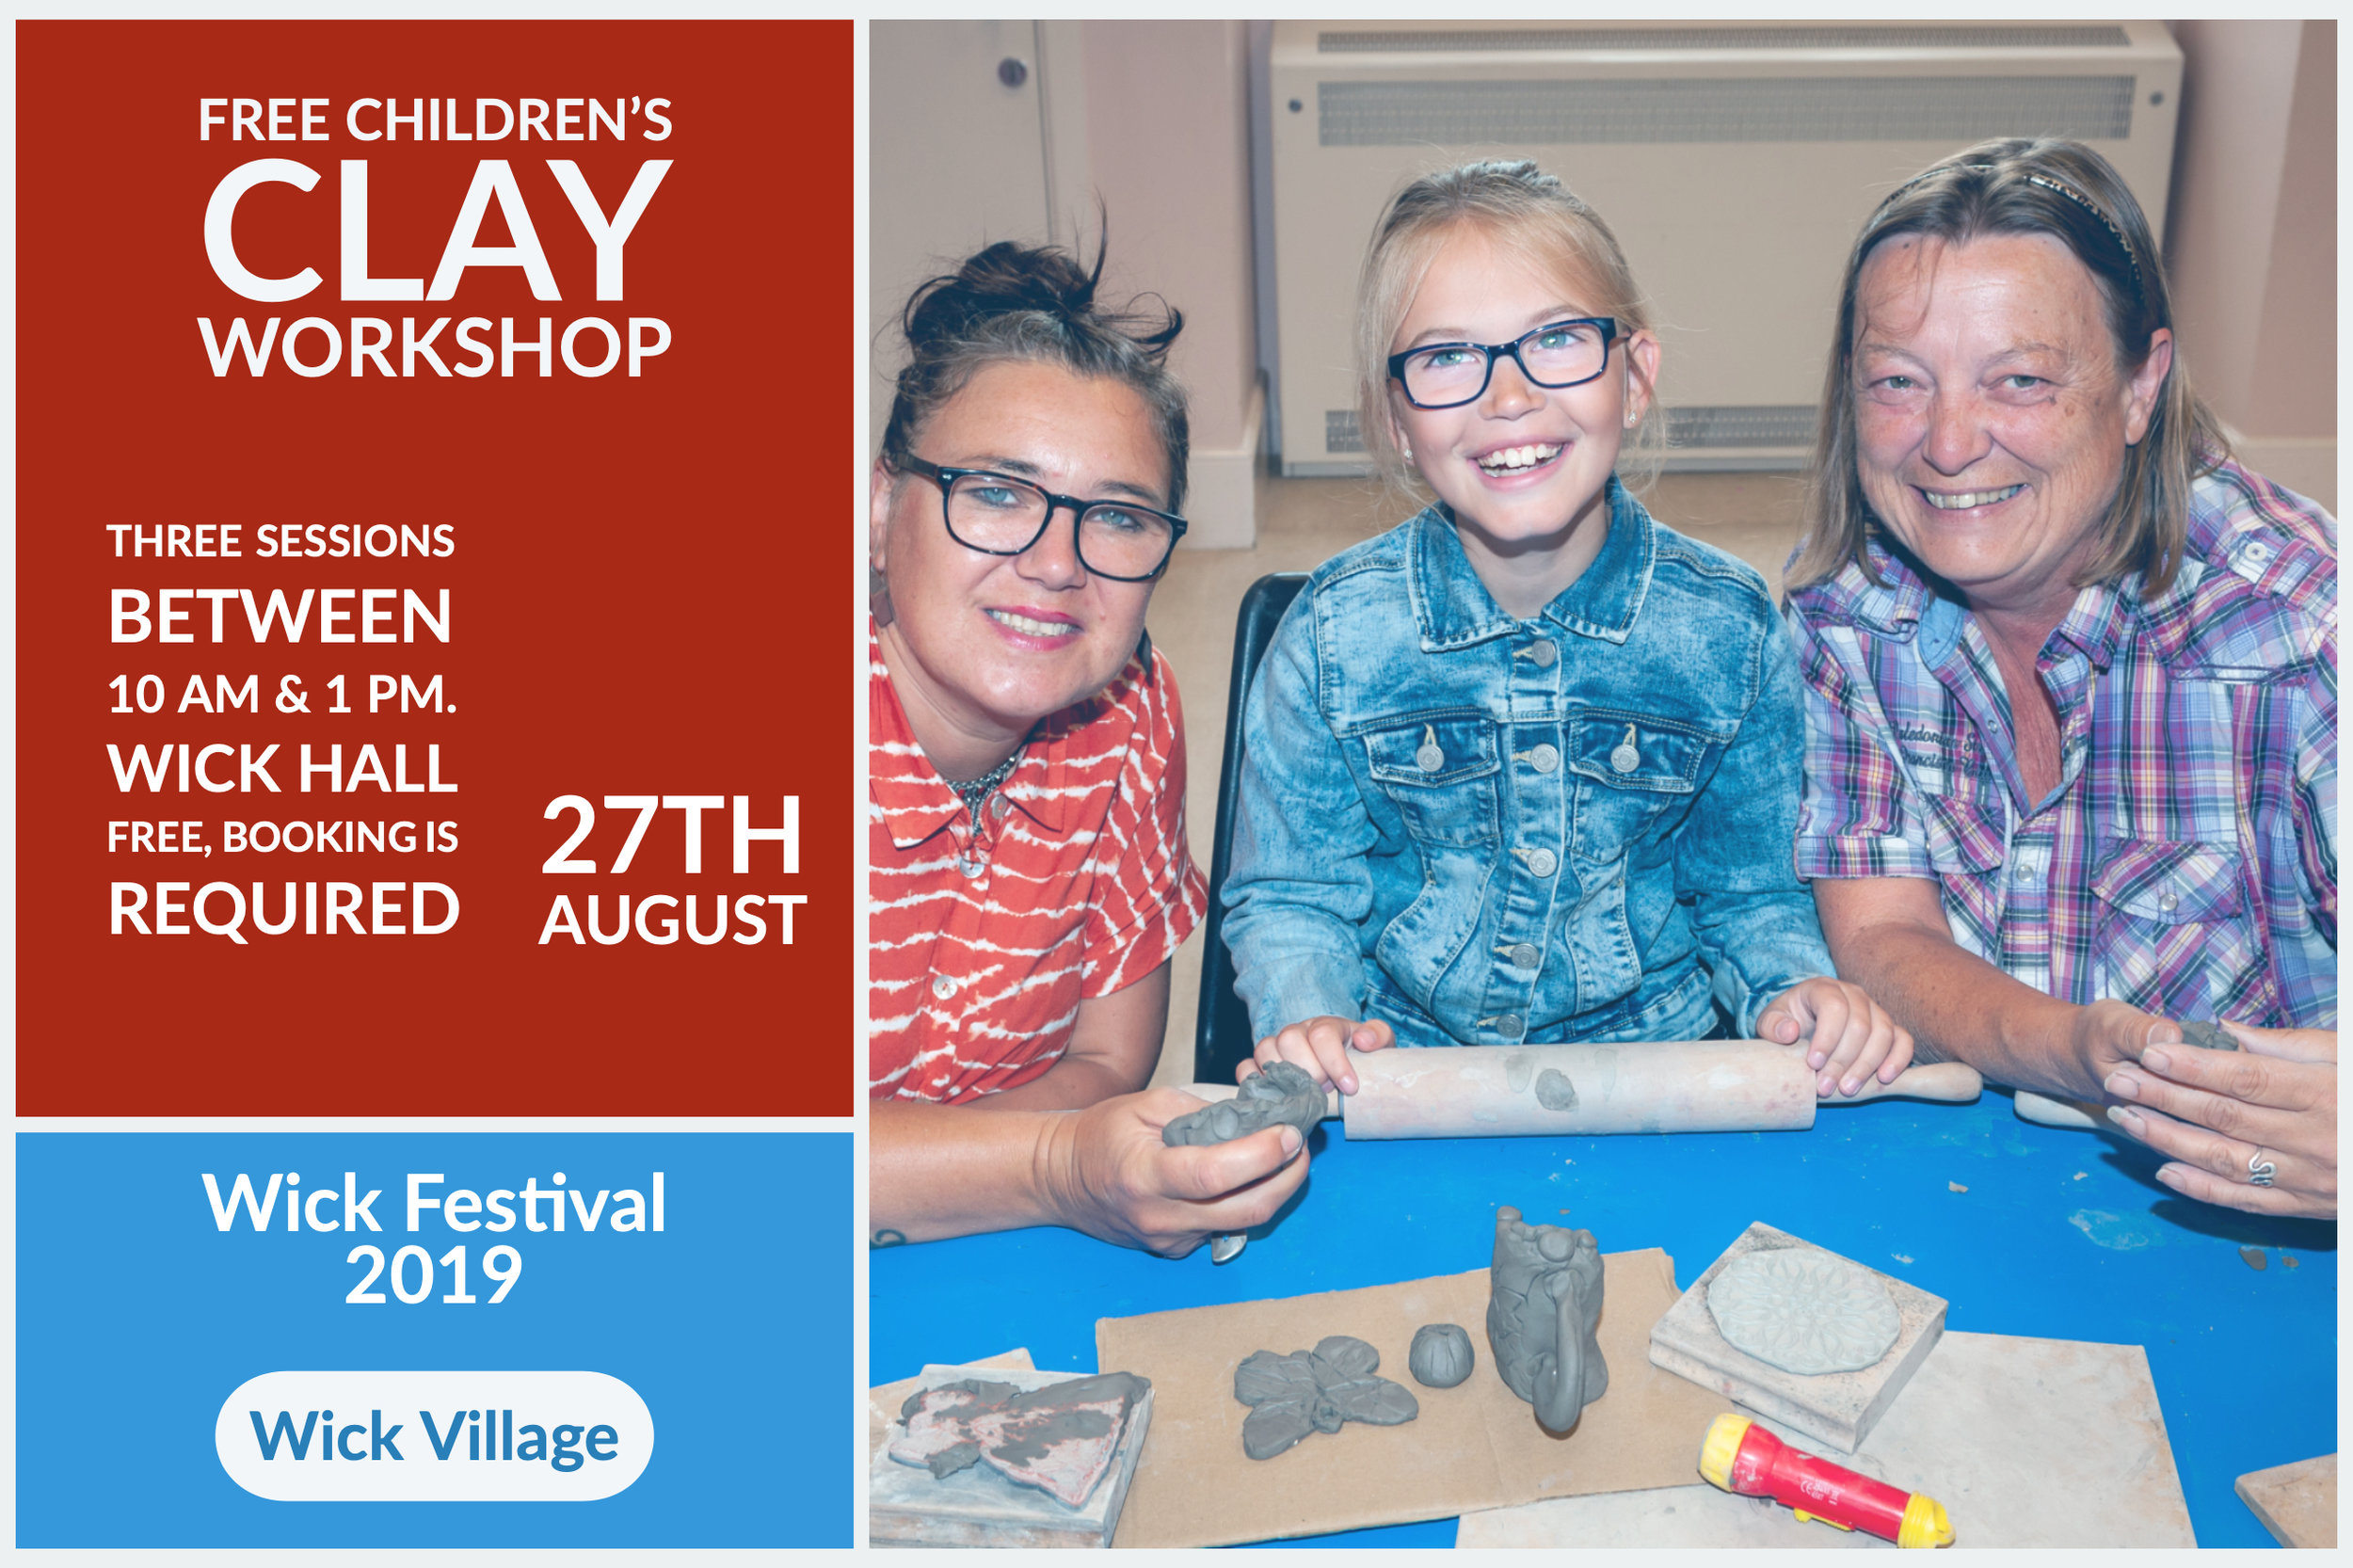 Wick Festival - Free Children's Clay Workshop